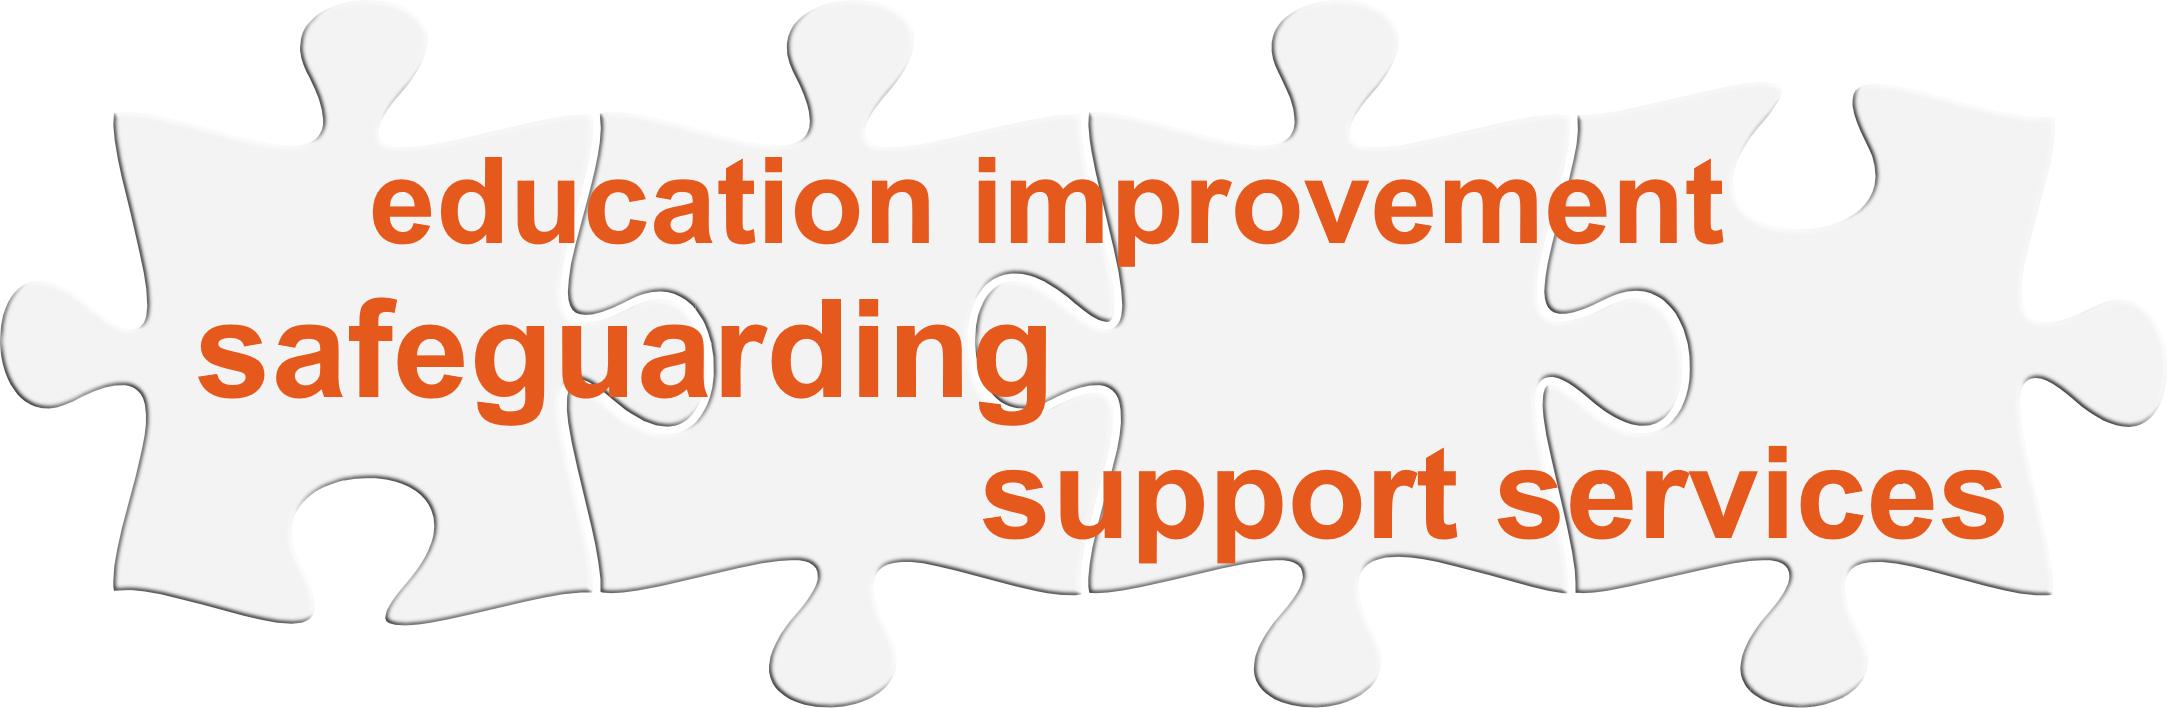 Solgrid education logo - jigsaw pieces